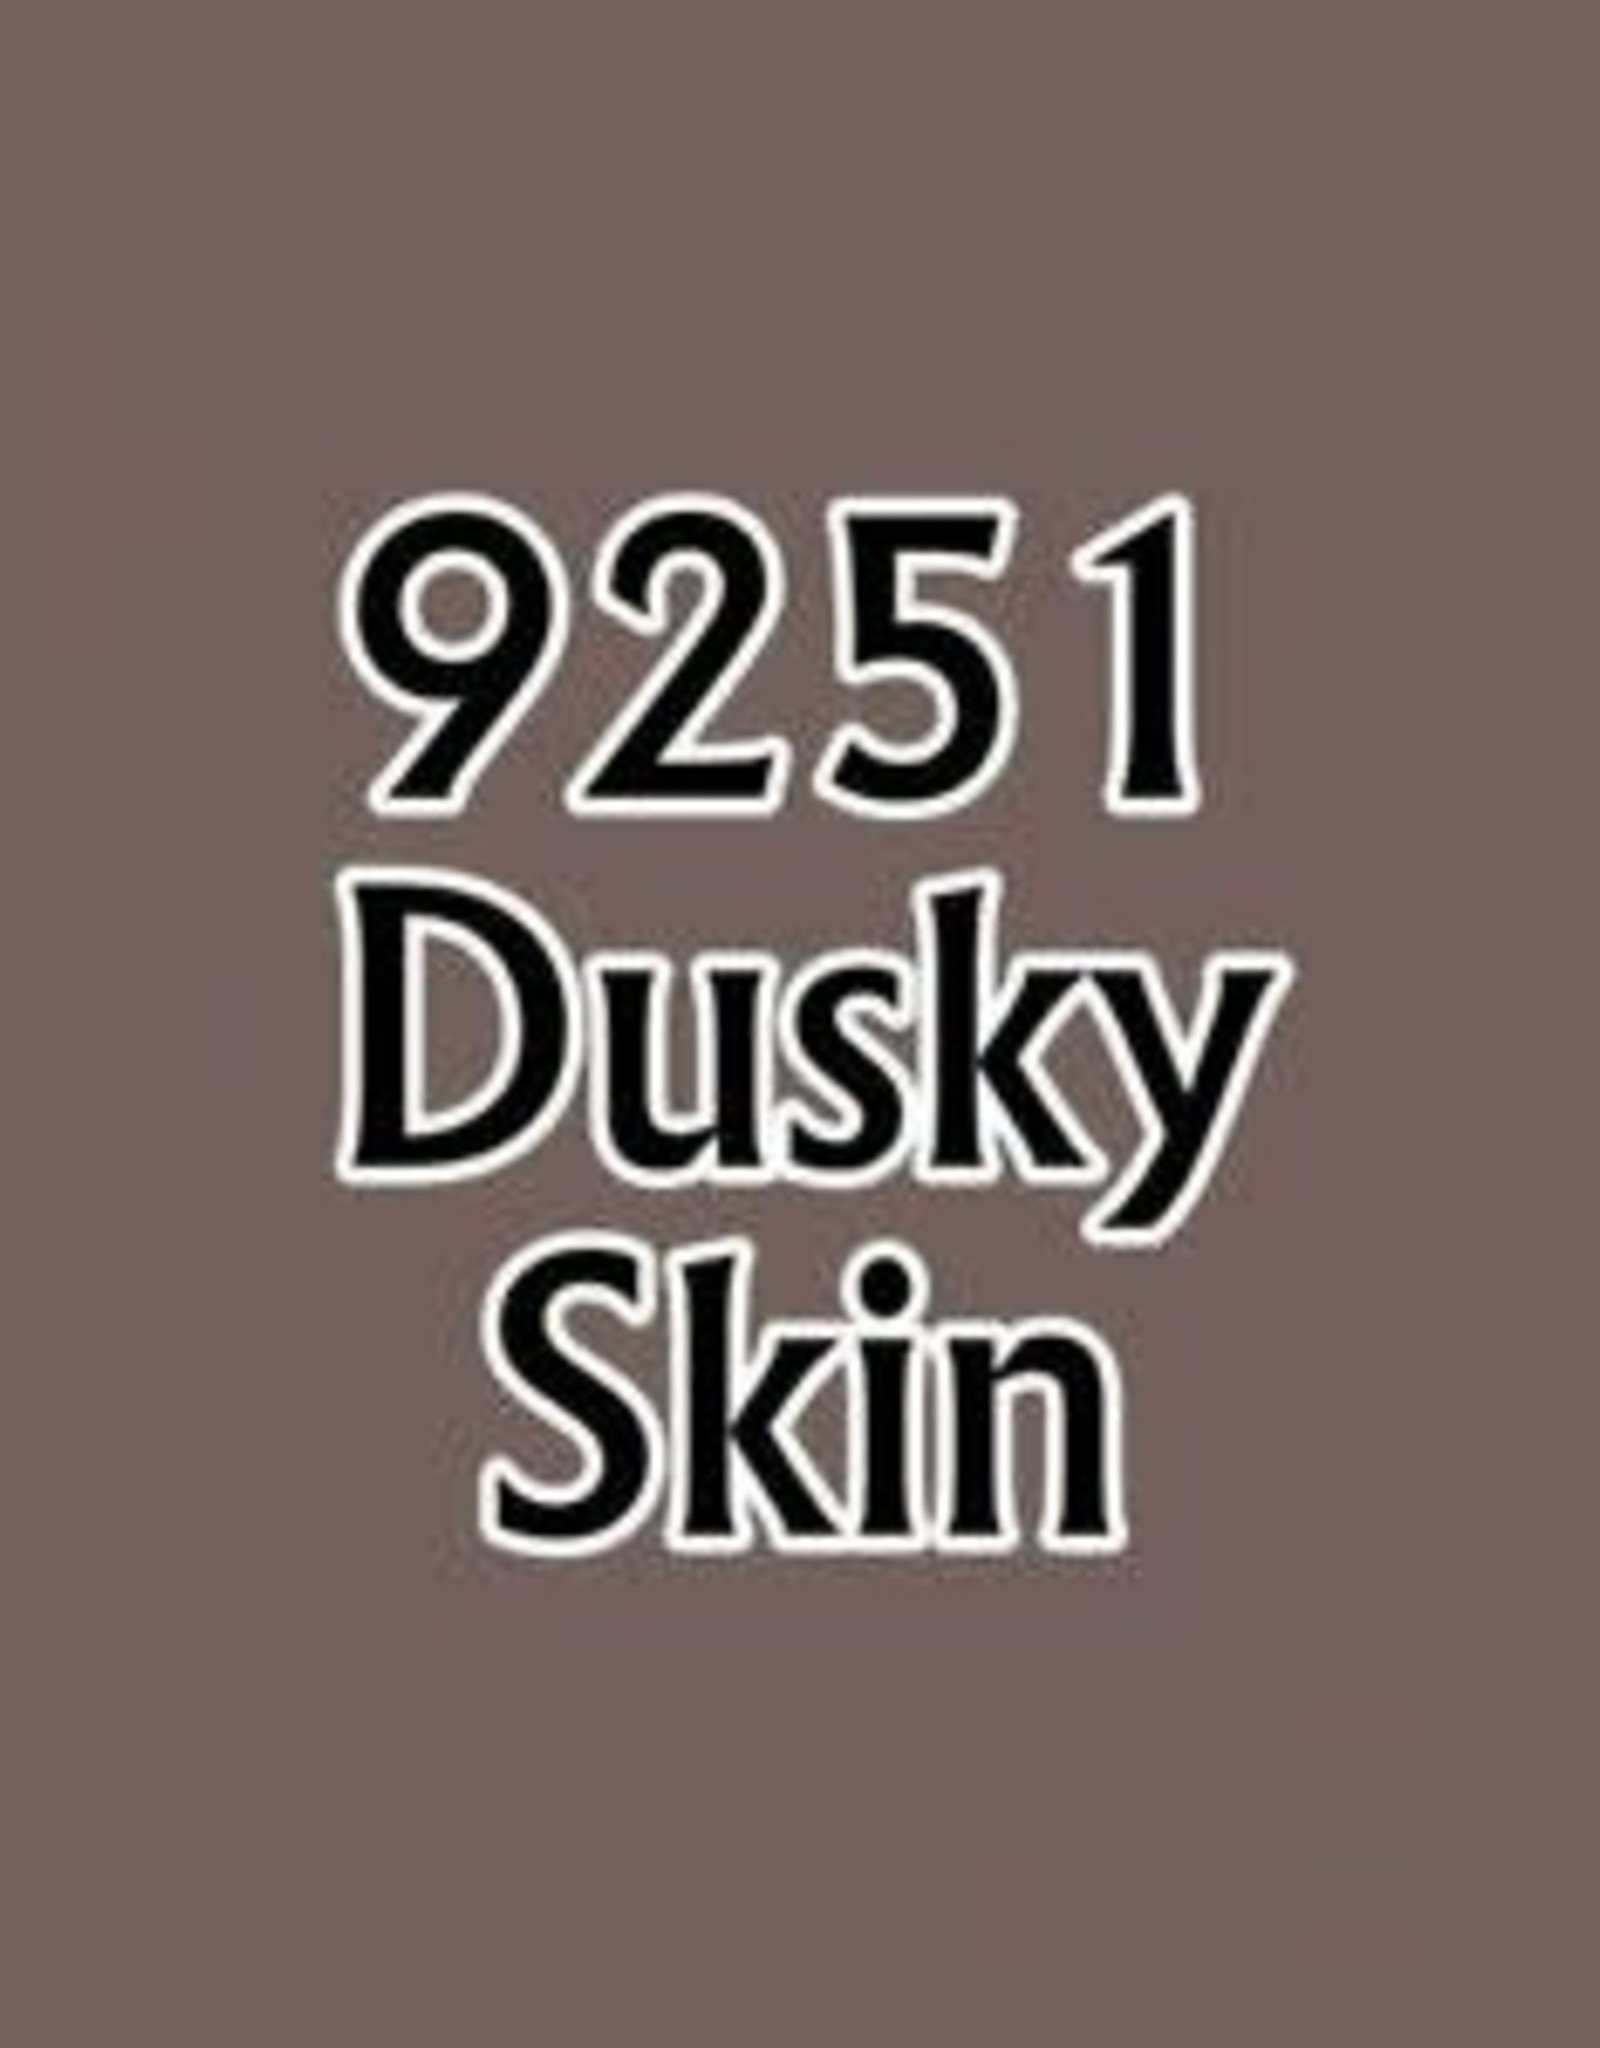 Reaper Dusky Skin